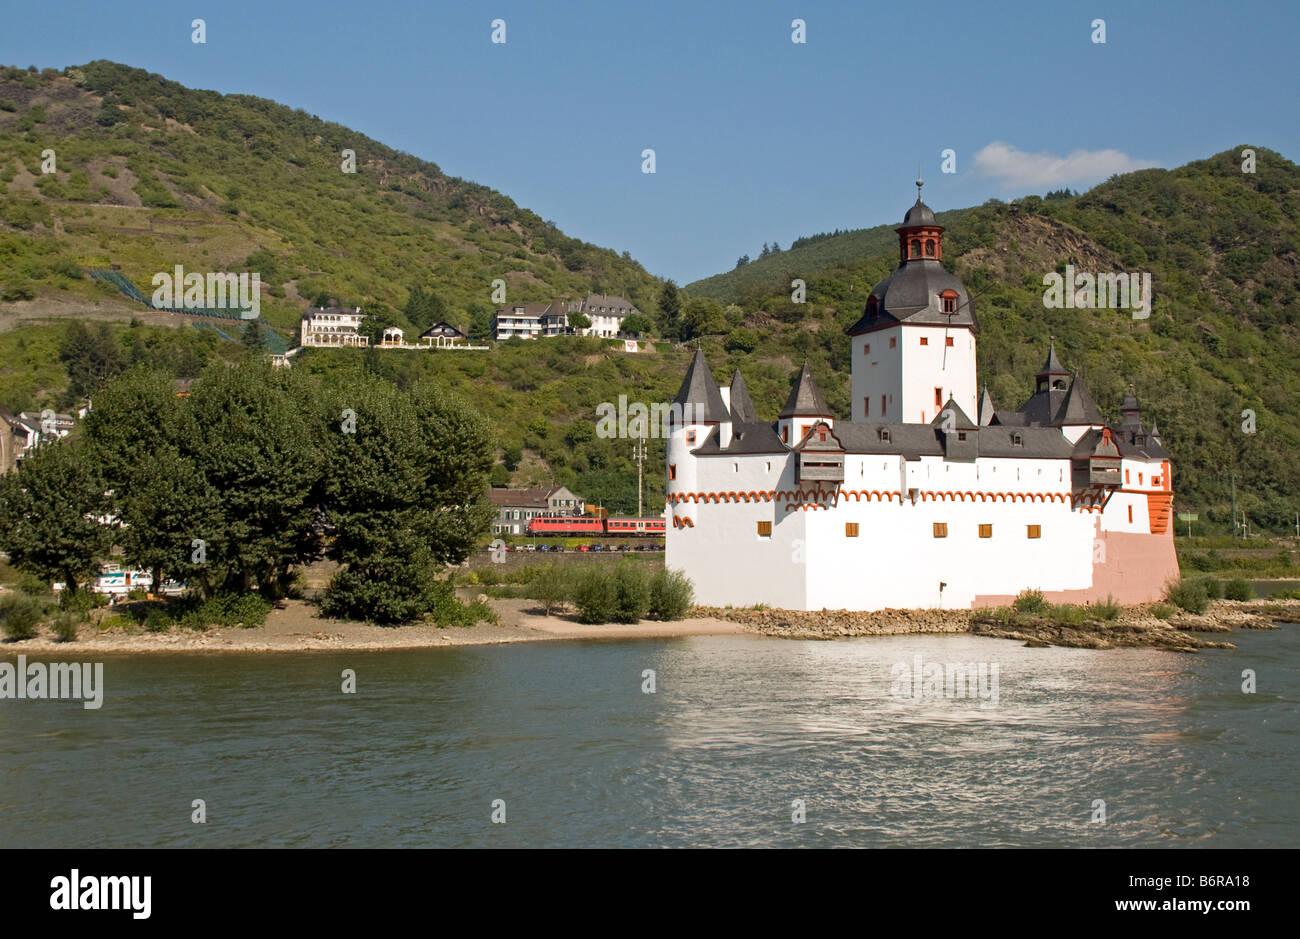 Pfalz Fortress on Rhine River at Kaub with intercity train in background Stock Photo